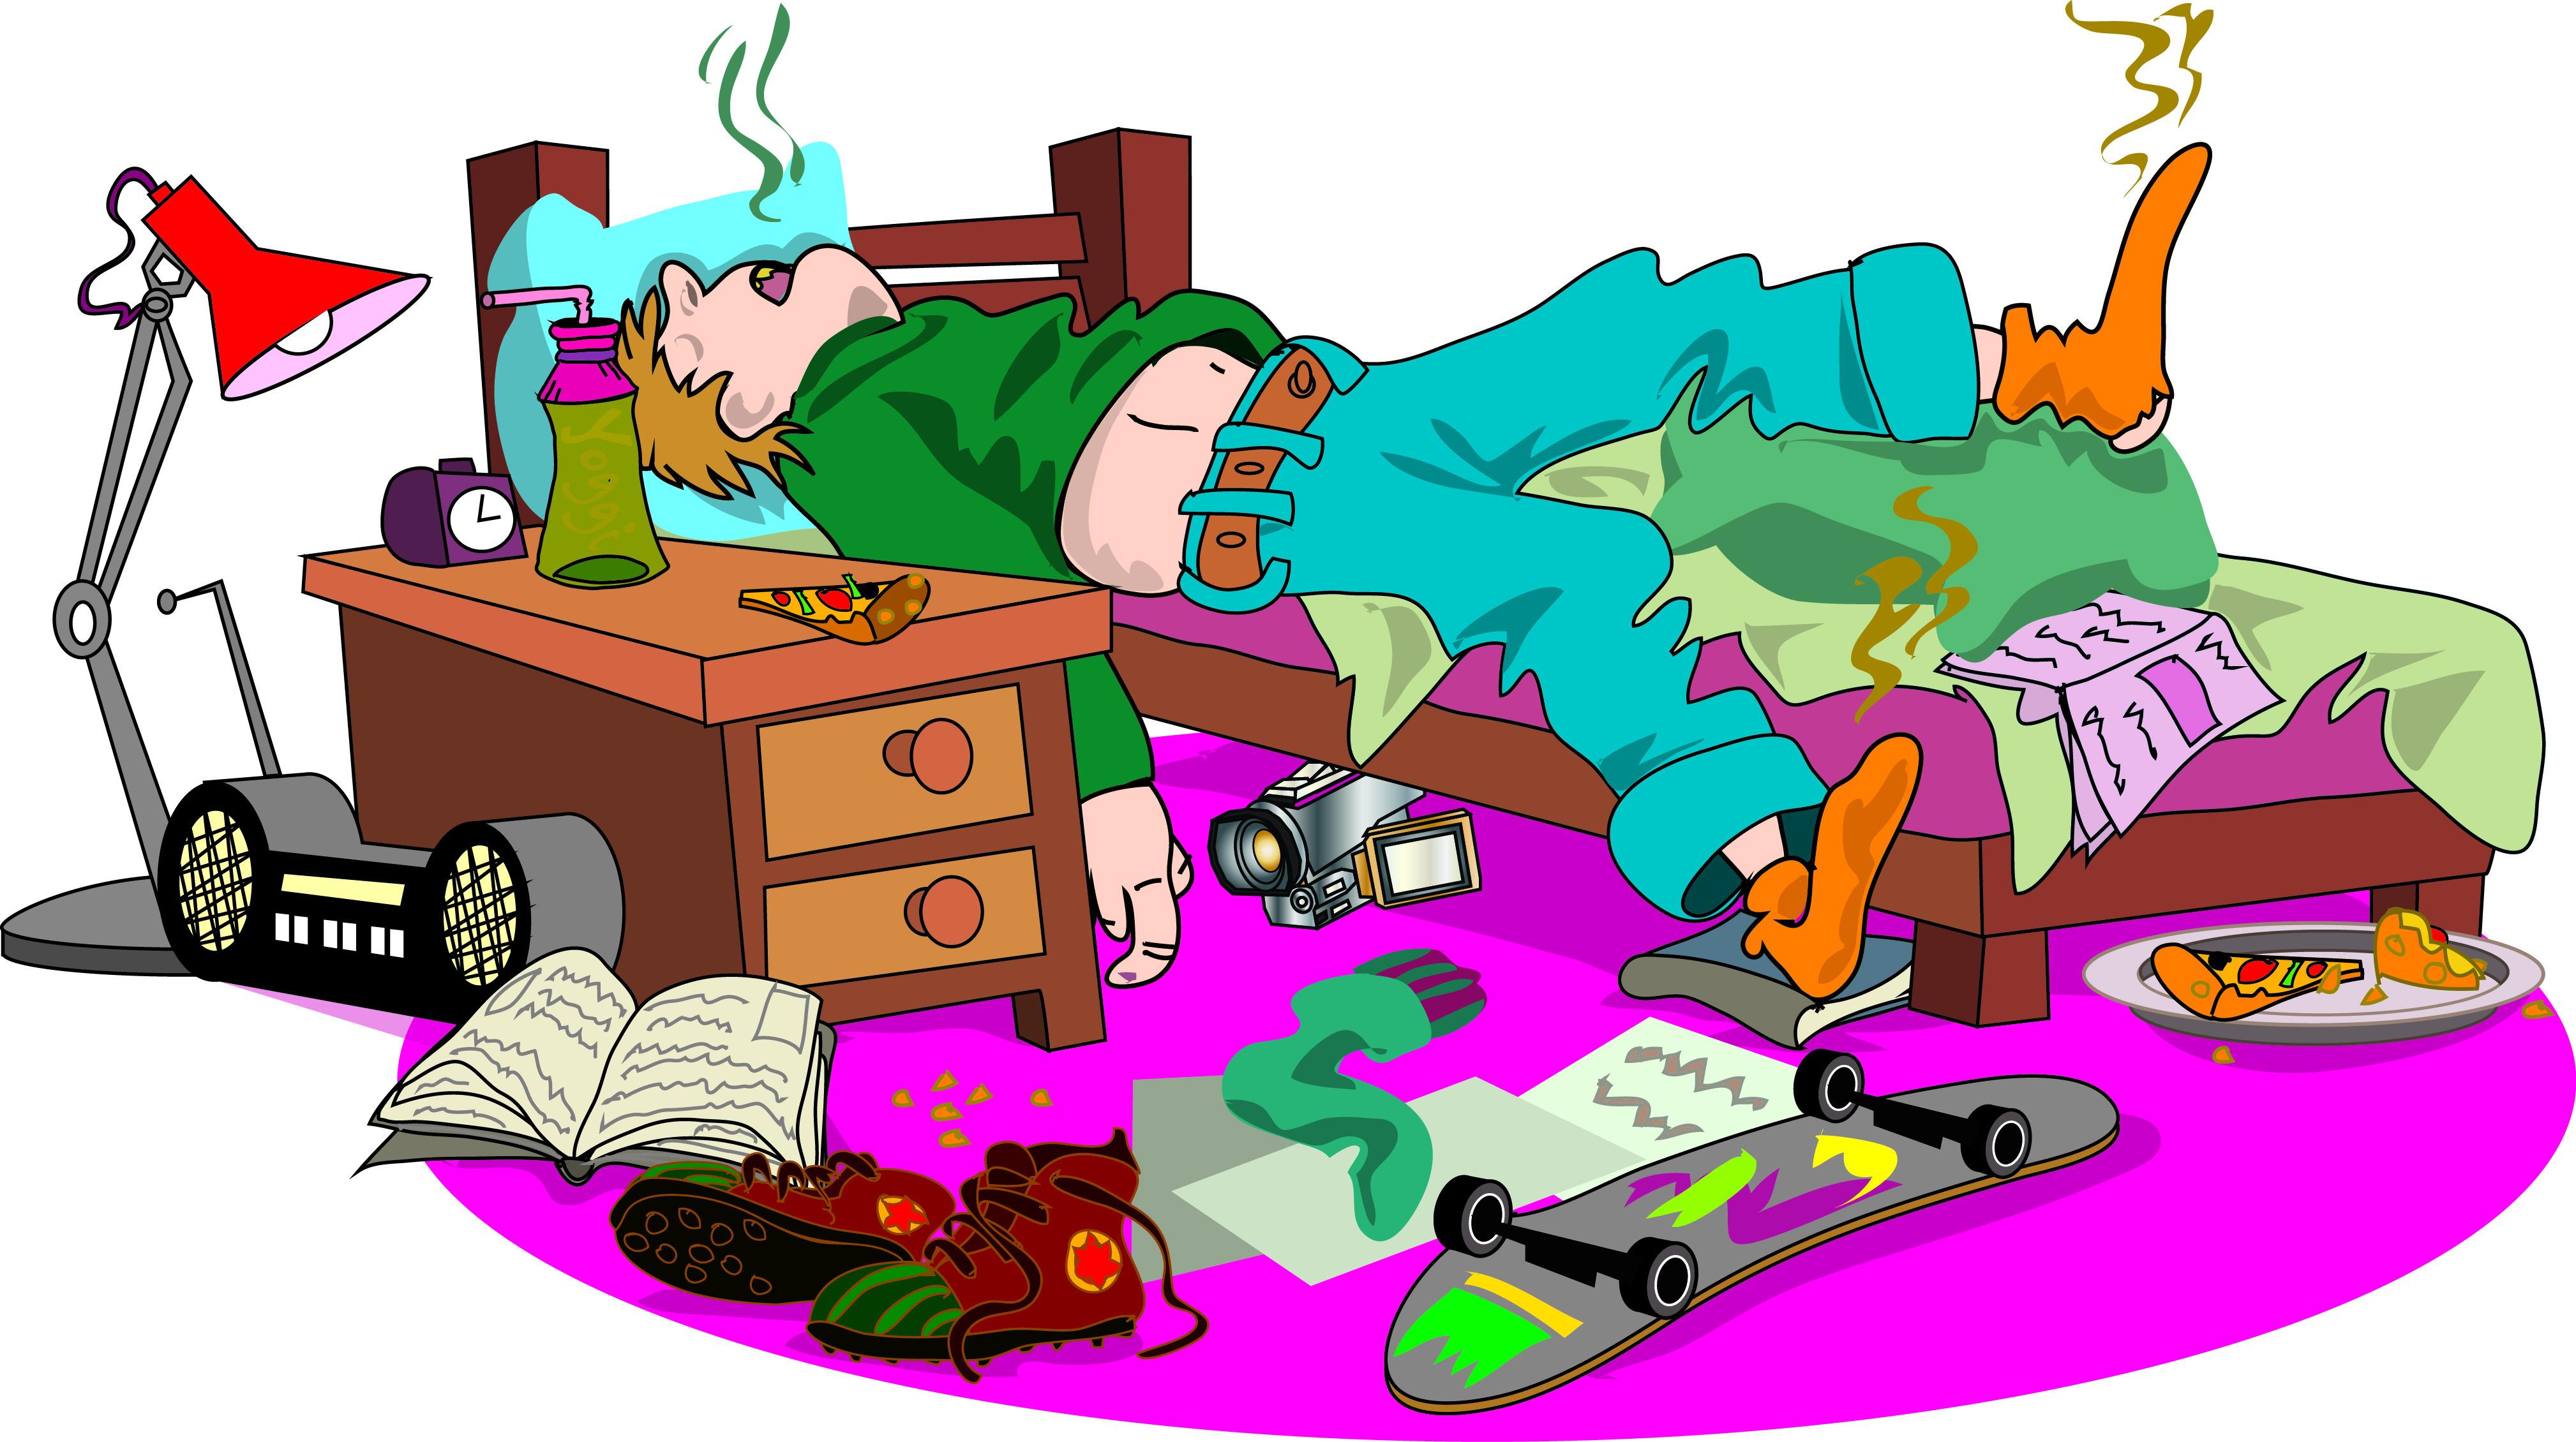 Картинка лодыря лентяя